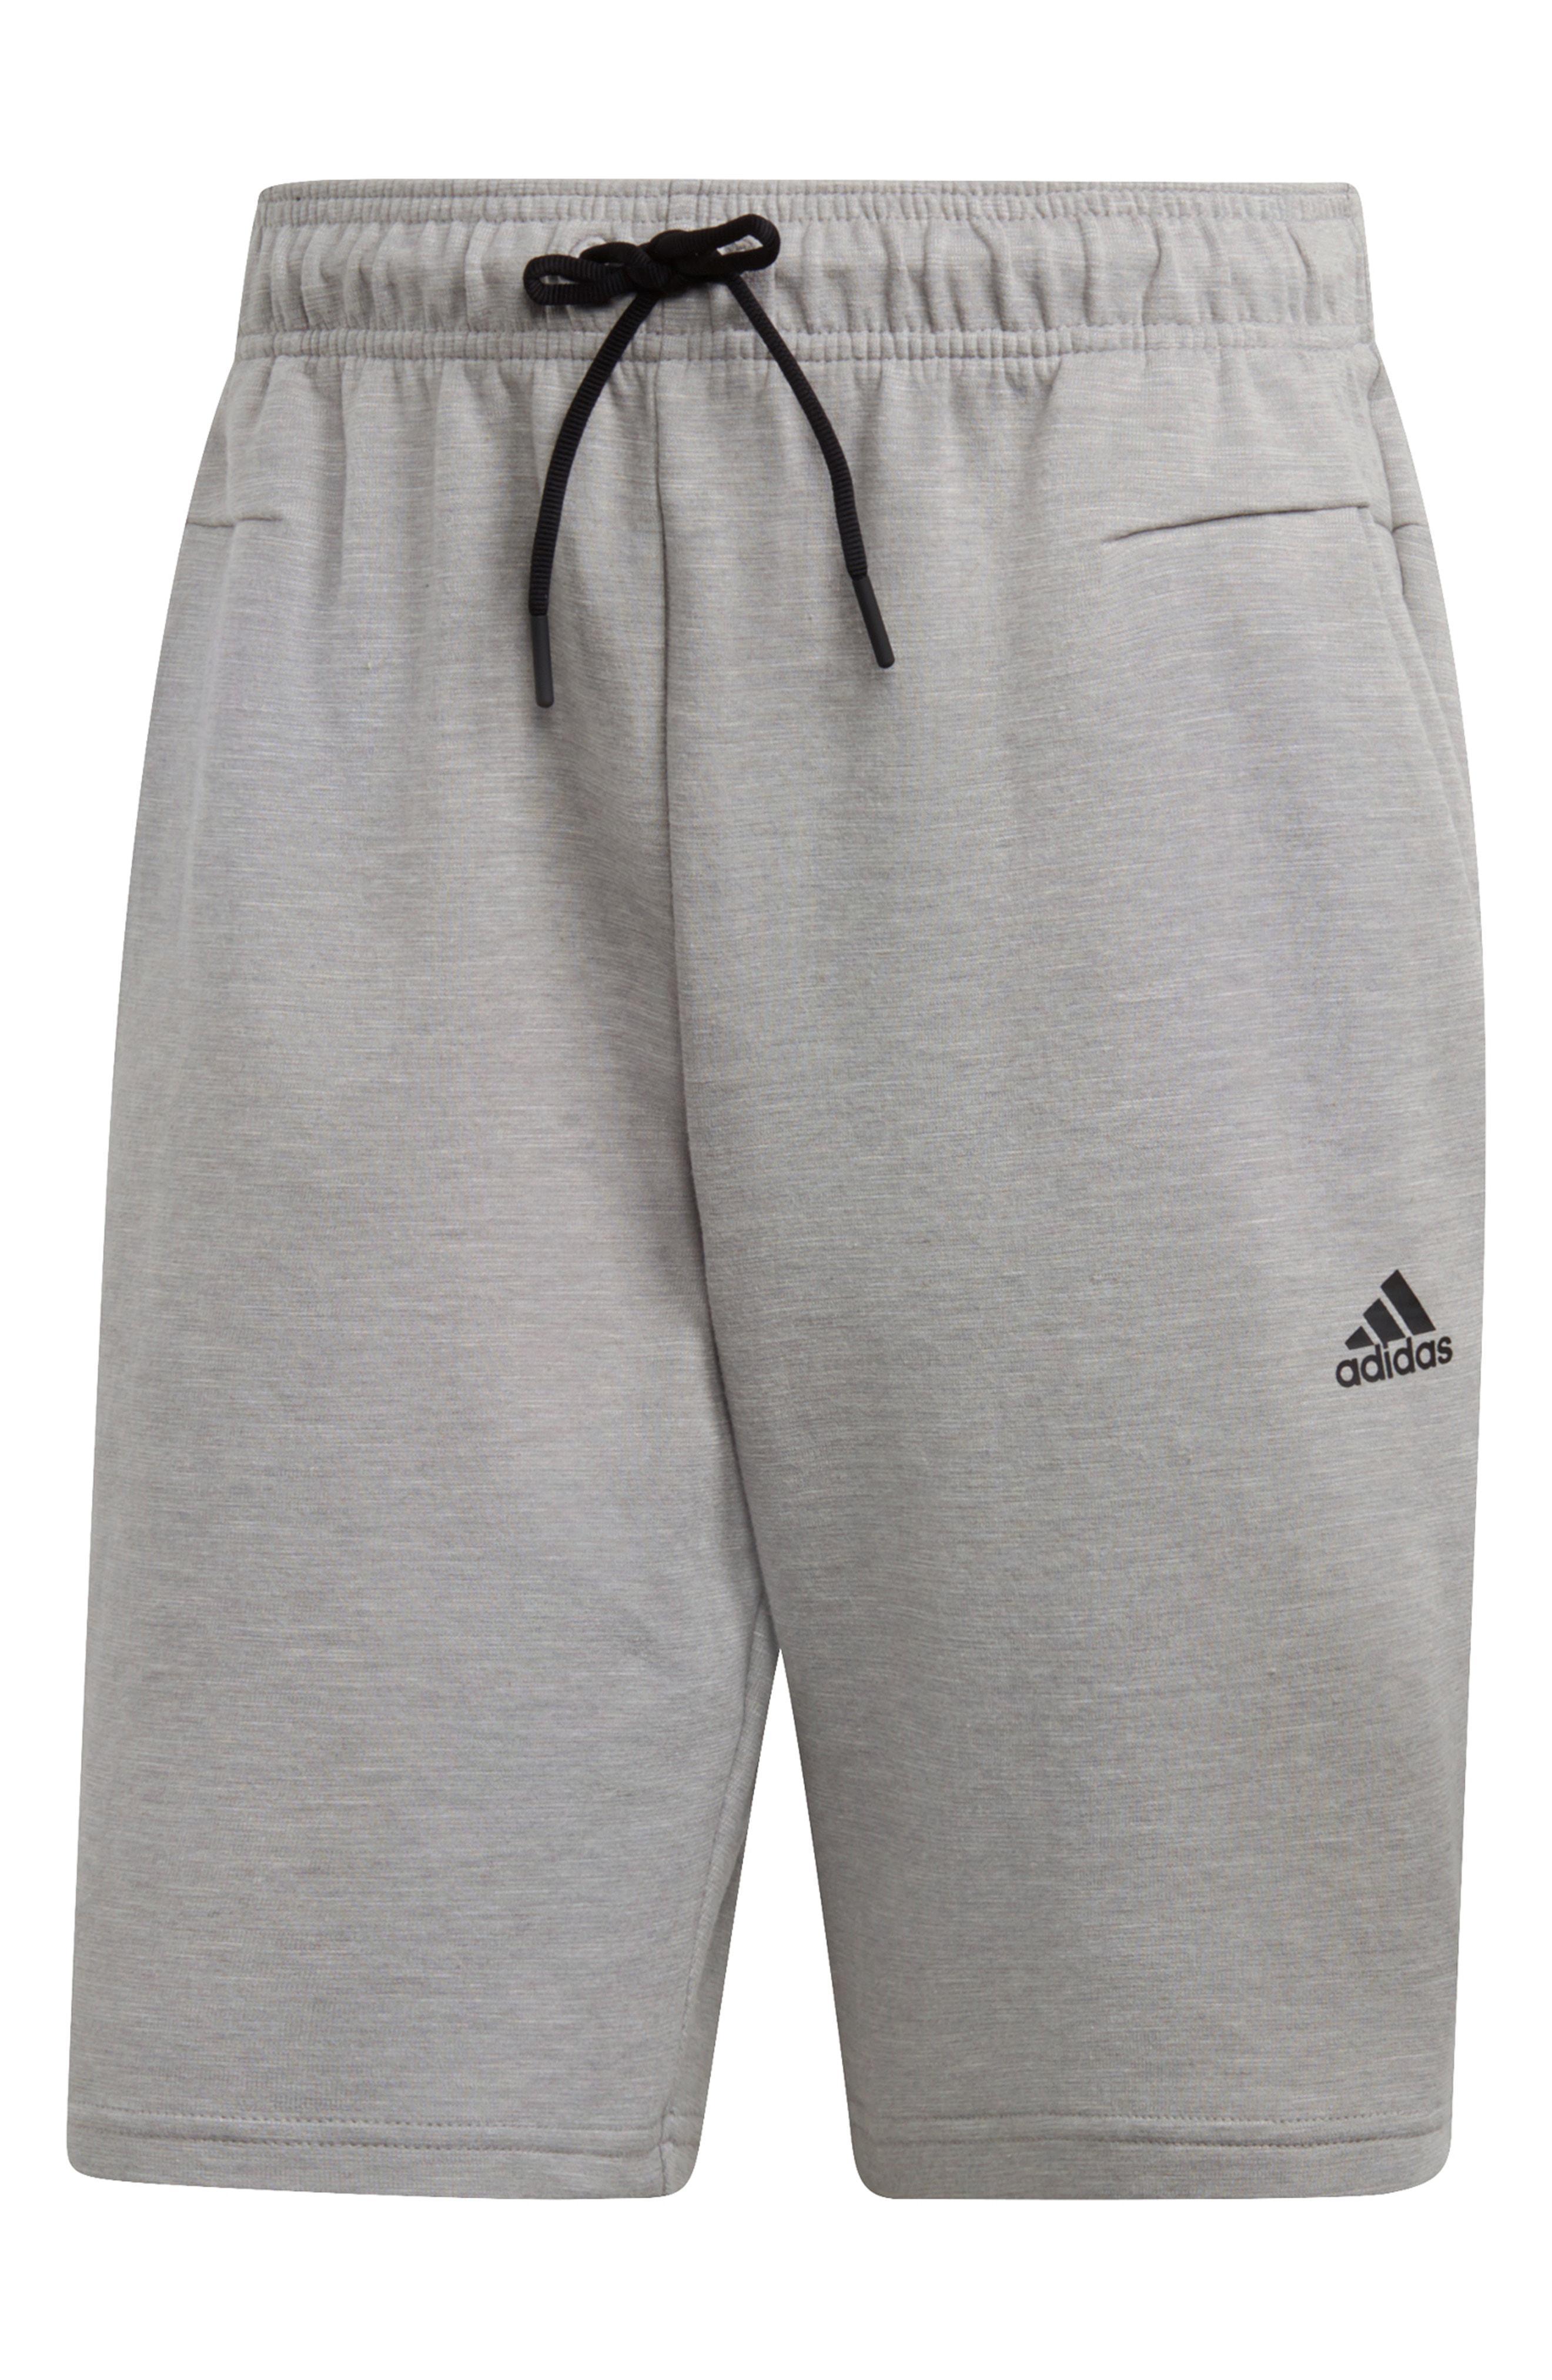 fcf3567a9e ... Stadium Id Athletic Shorts for Men - Lyst. View fullscreen